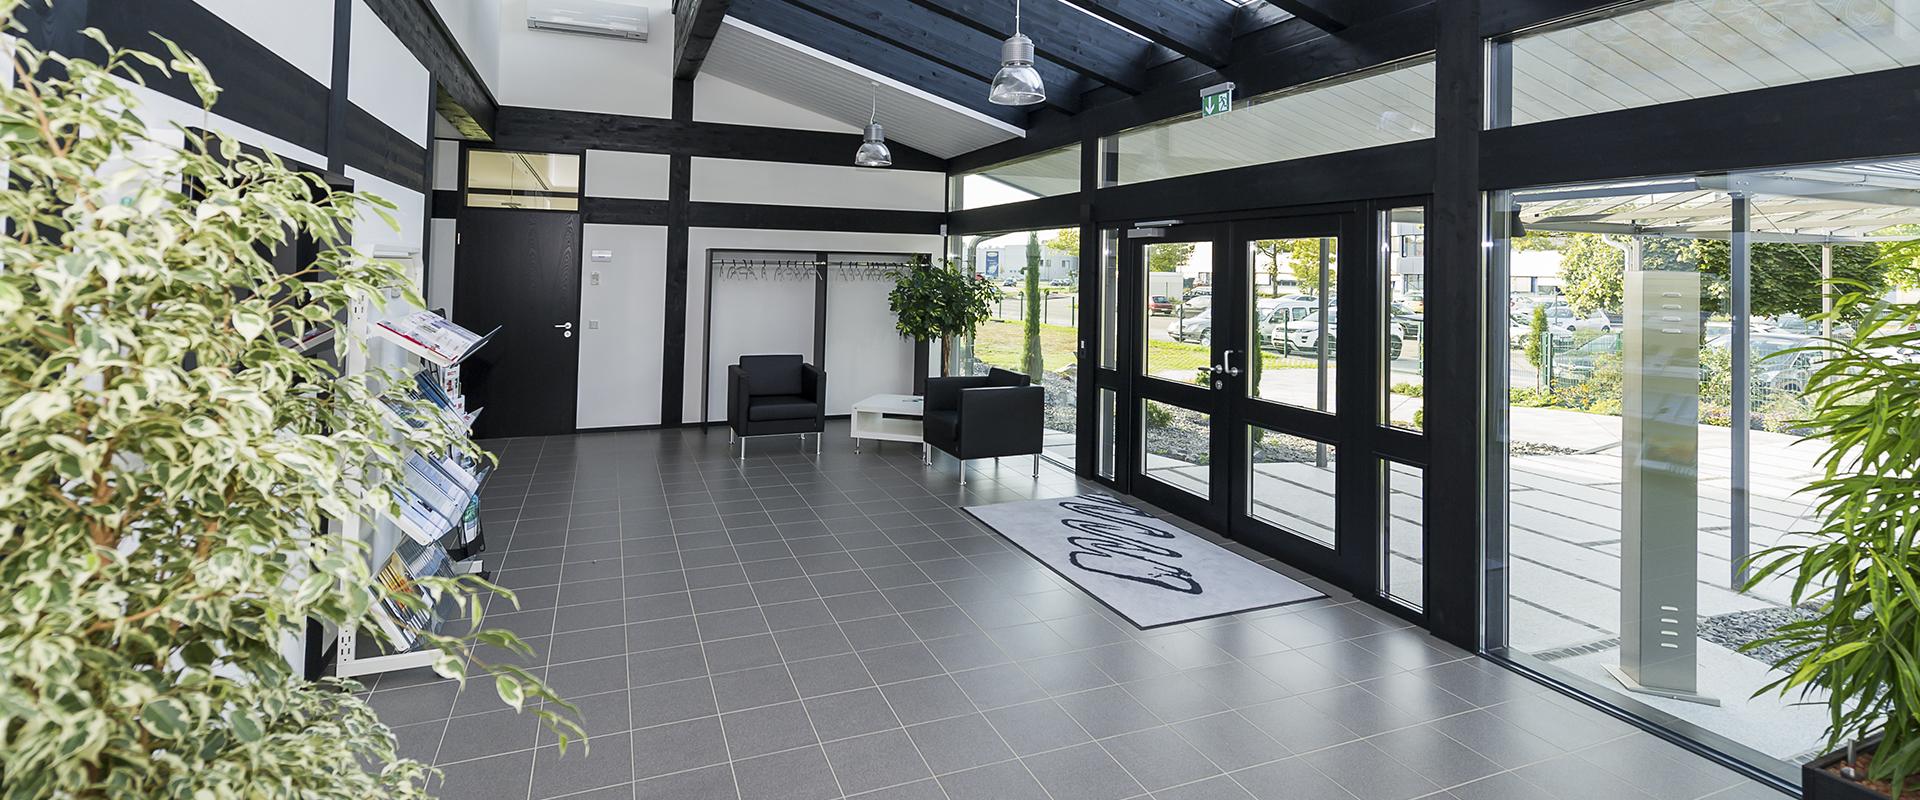 Innenausbau Göpper Innenausbau Fenster Möbel